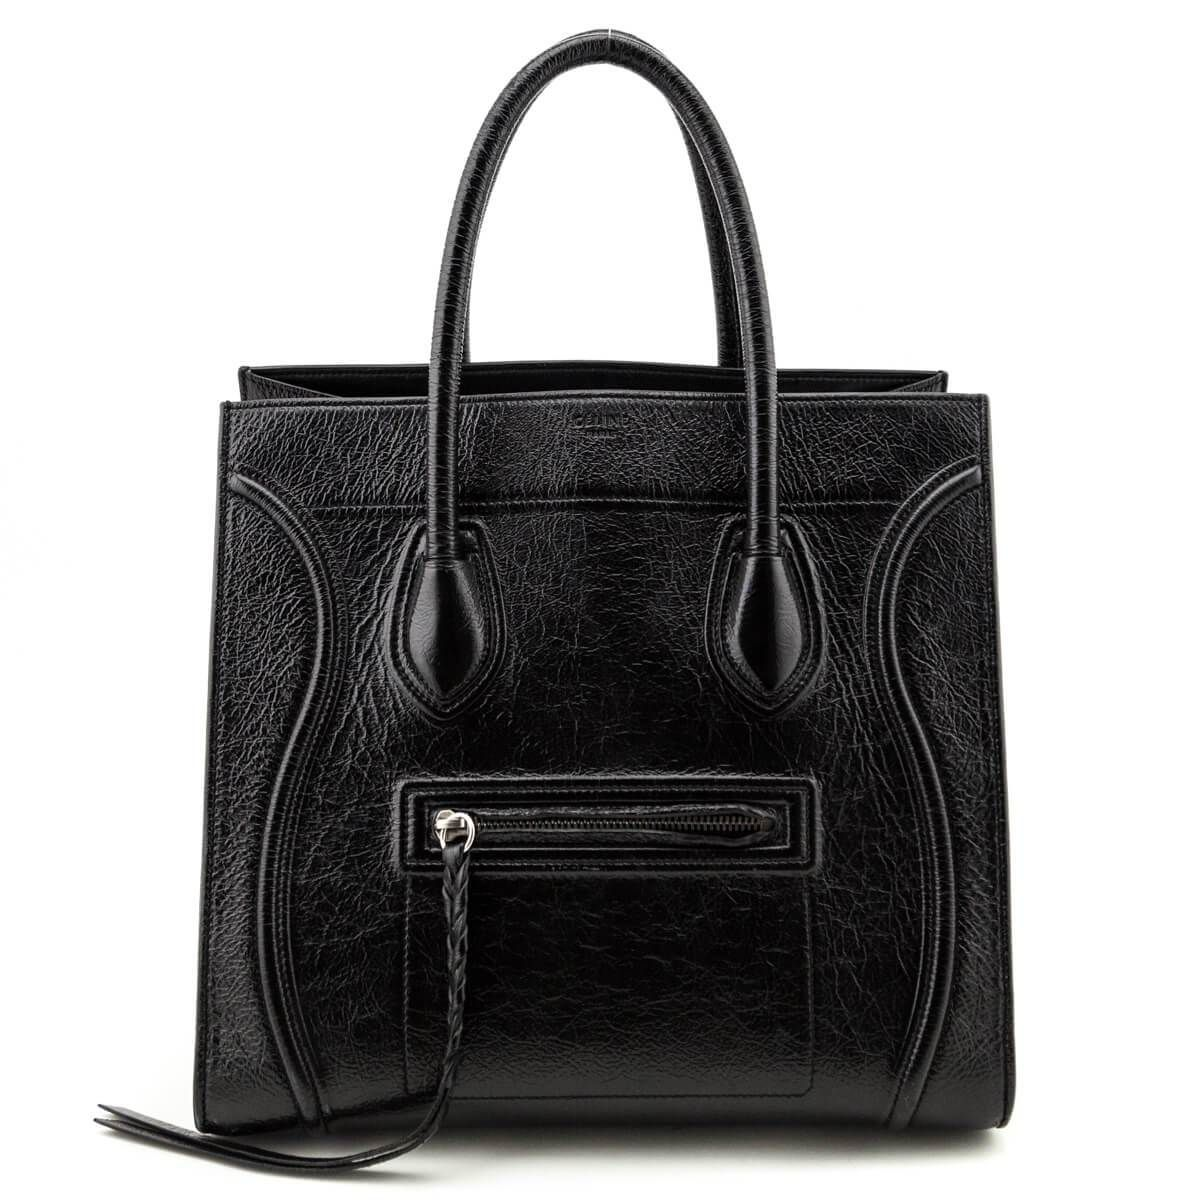 Celine Black Textured Patent Calfskin Medium Phantom Luggage Tote Trending Handbag Trendy Purses Popular Purses